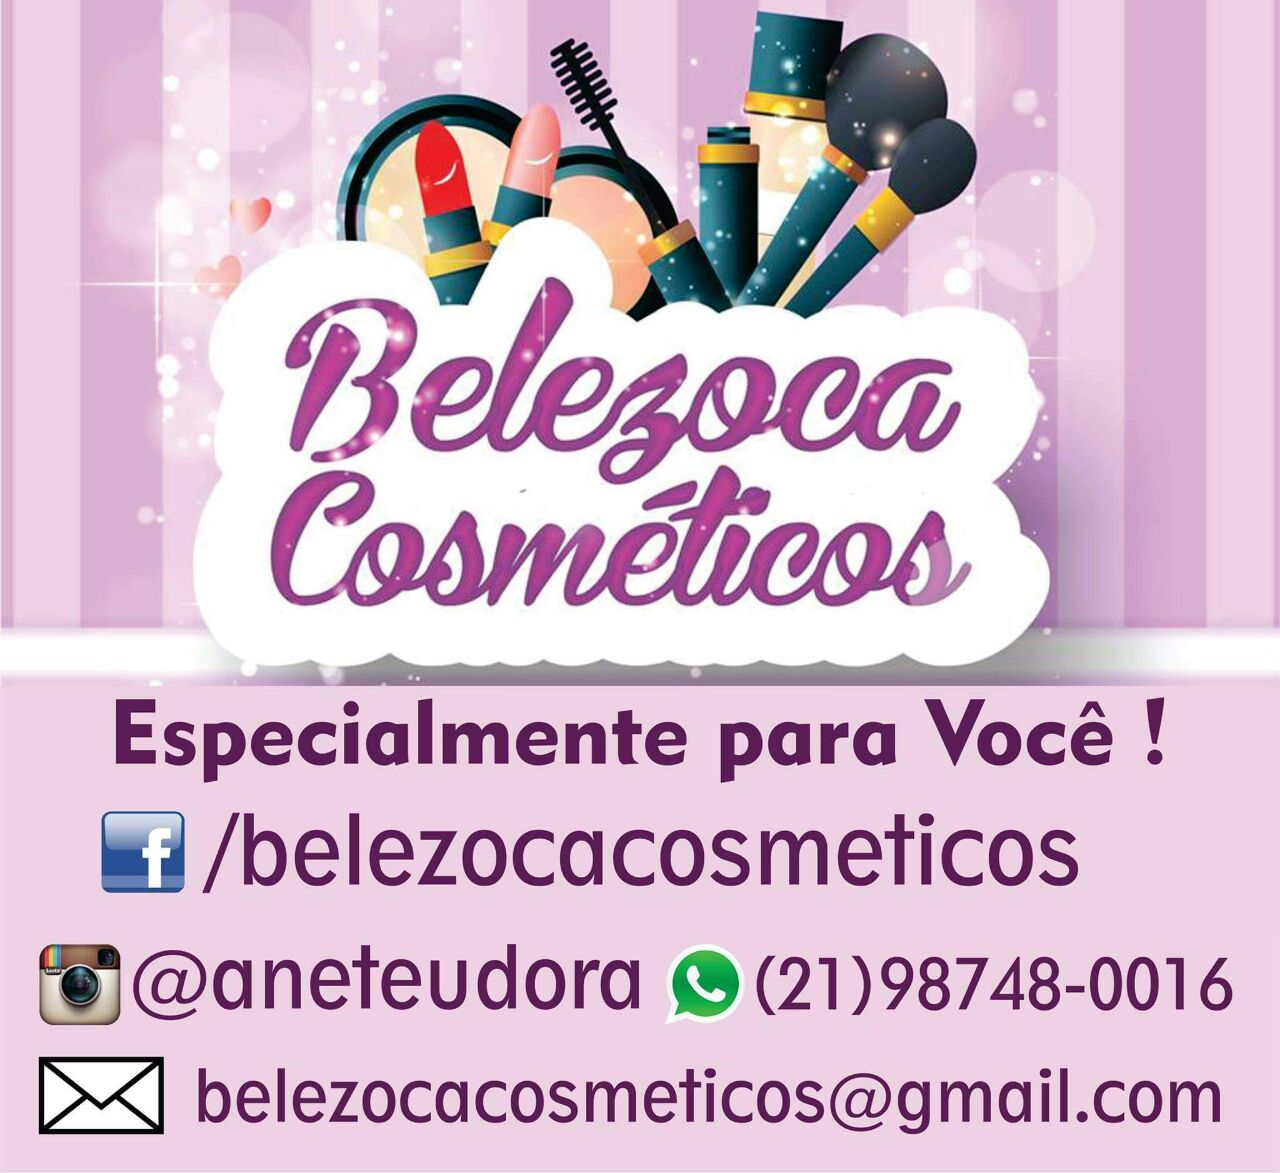 Belezoca cosméticos